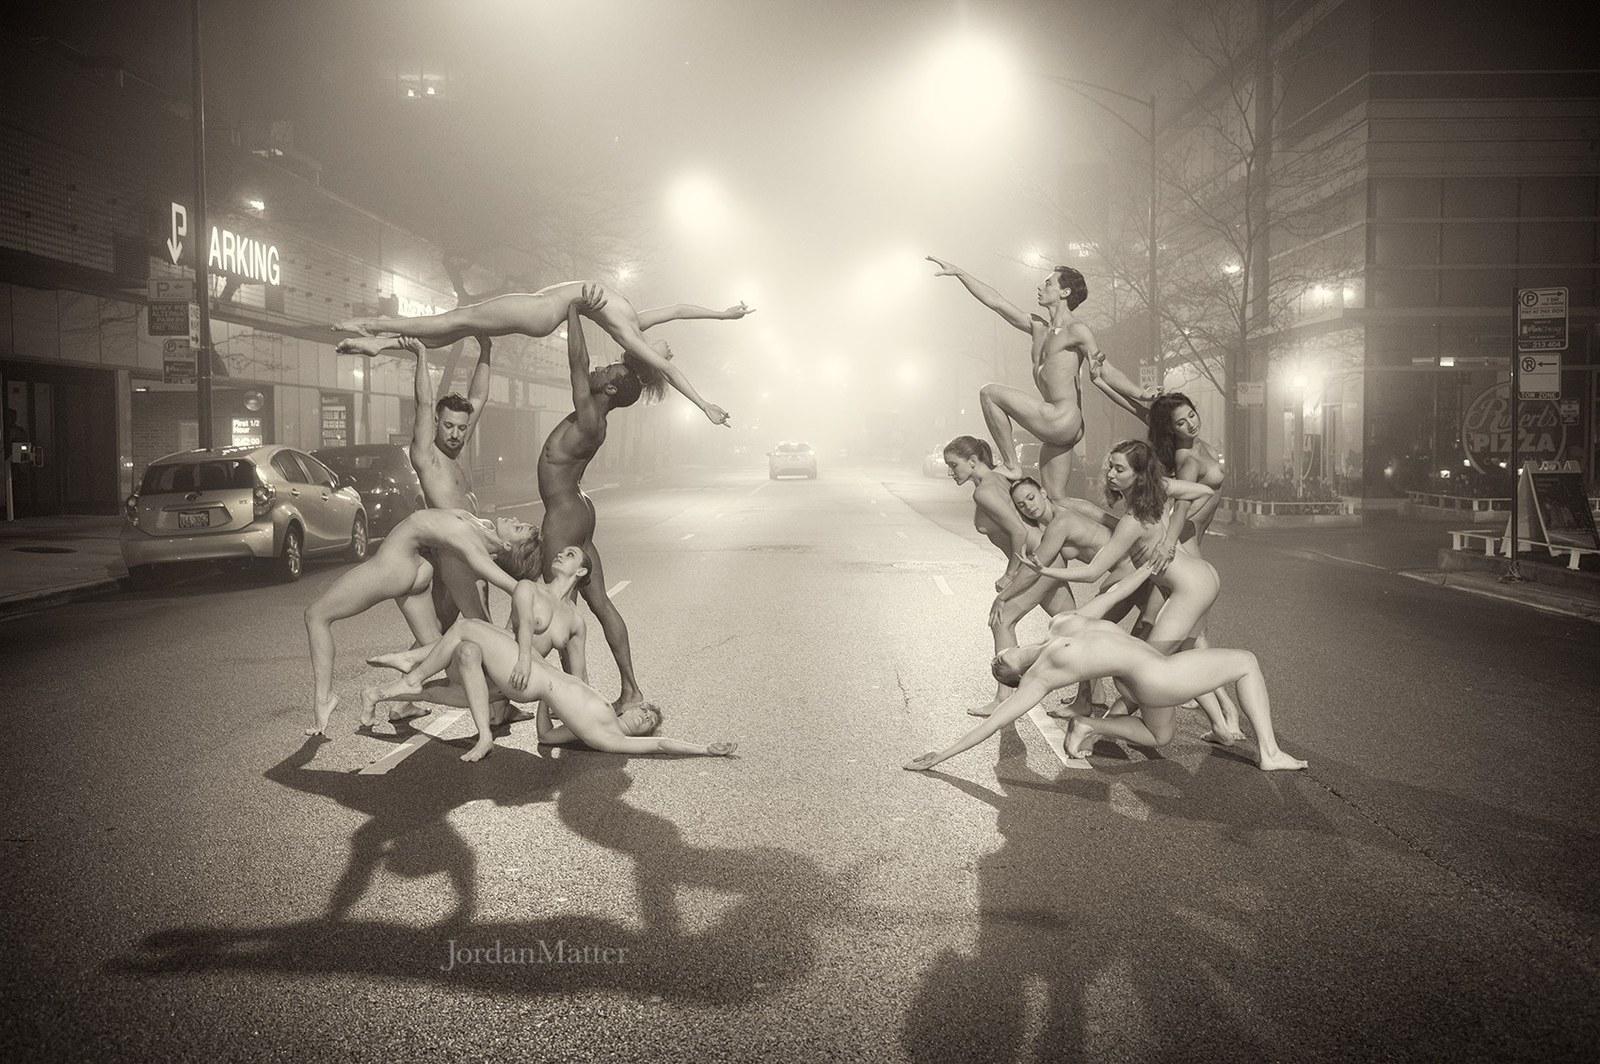 сантиметр джордан маттер фото с балеринами как только доходит